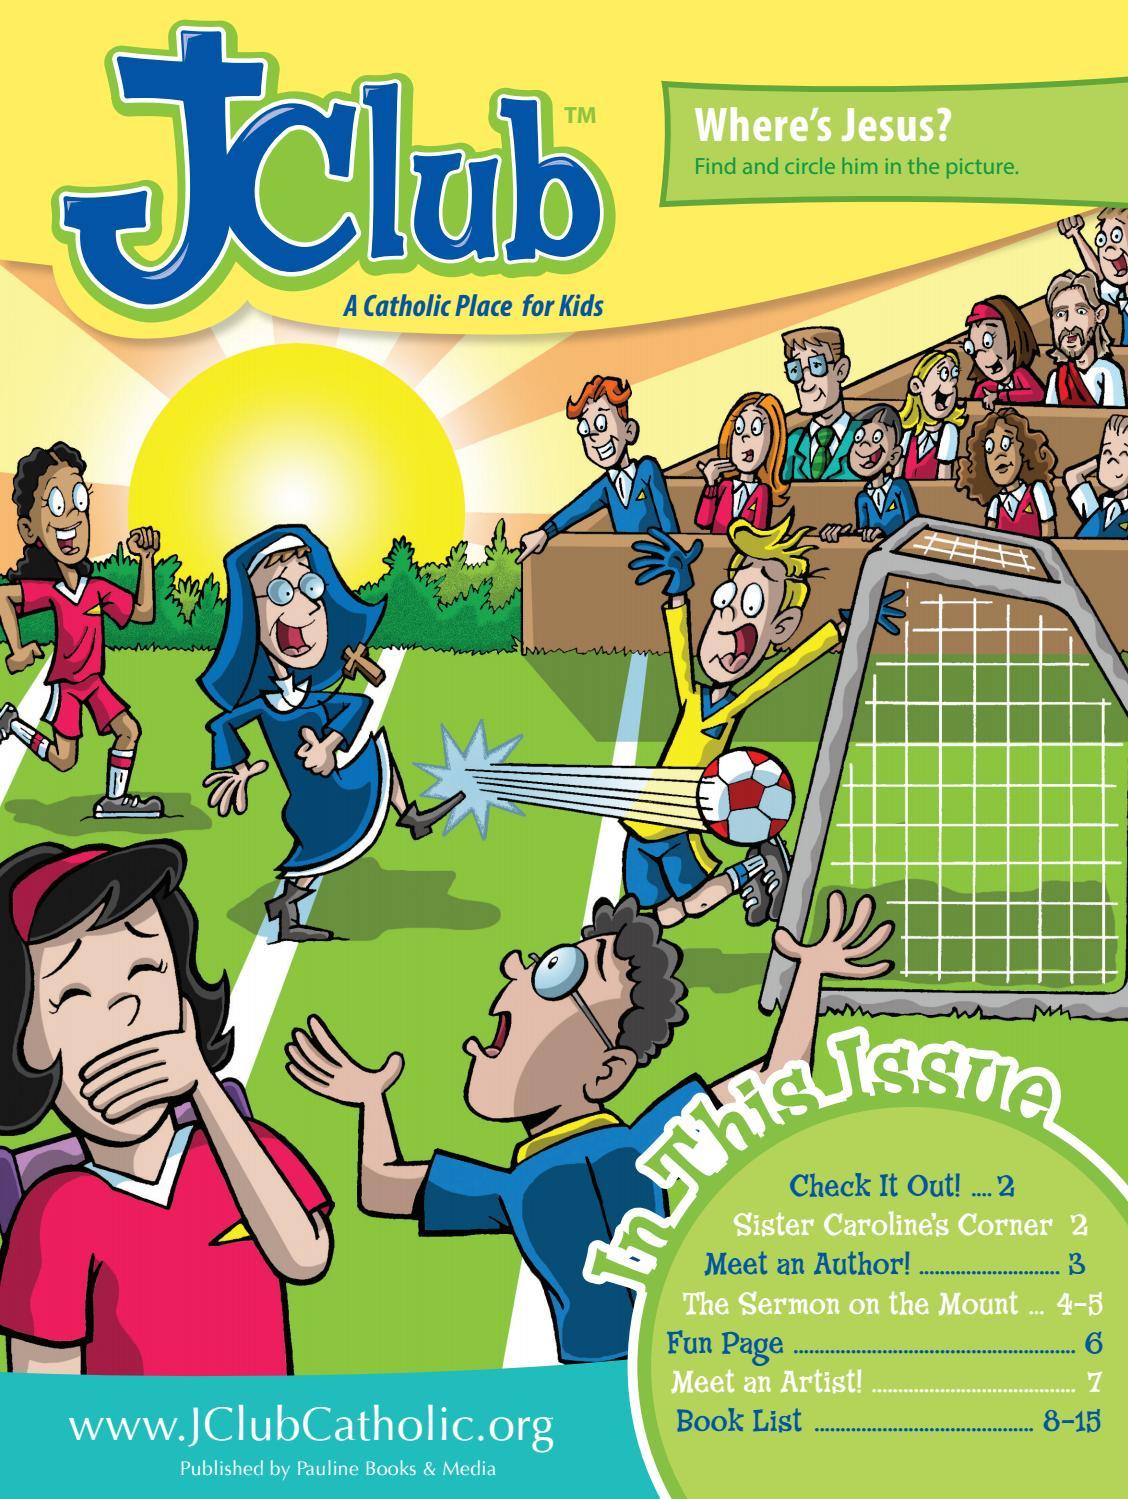 Jclub Magazine Fall 2016 by Pauline Books and Media - issuu